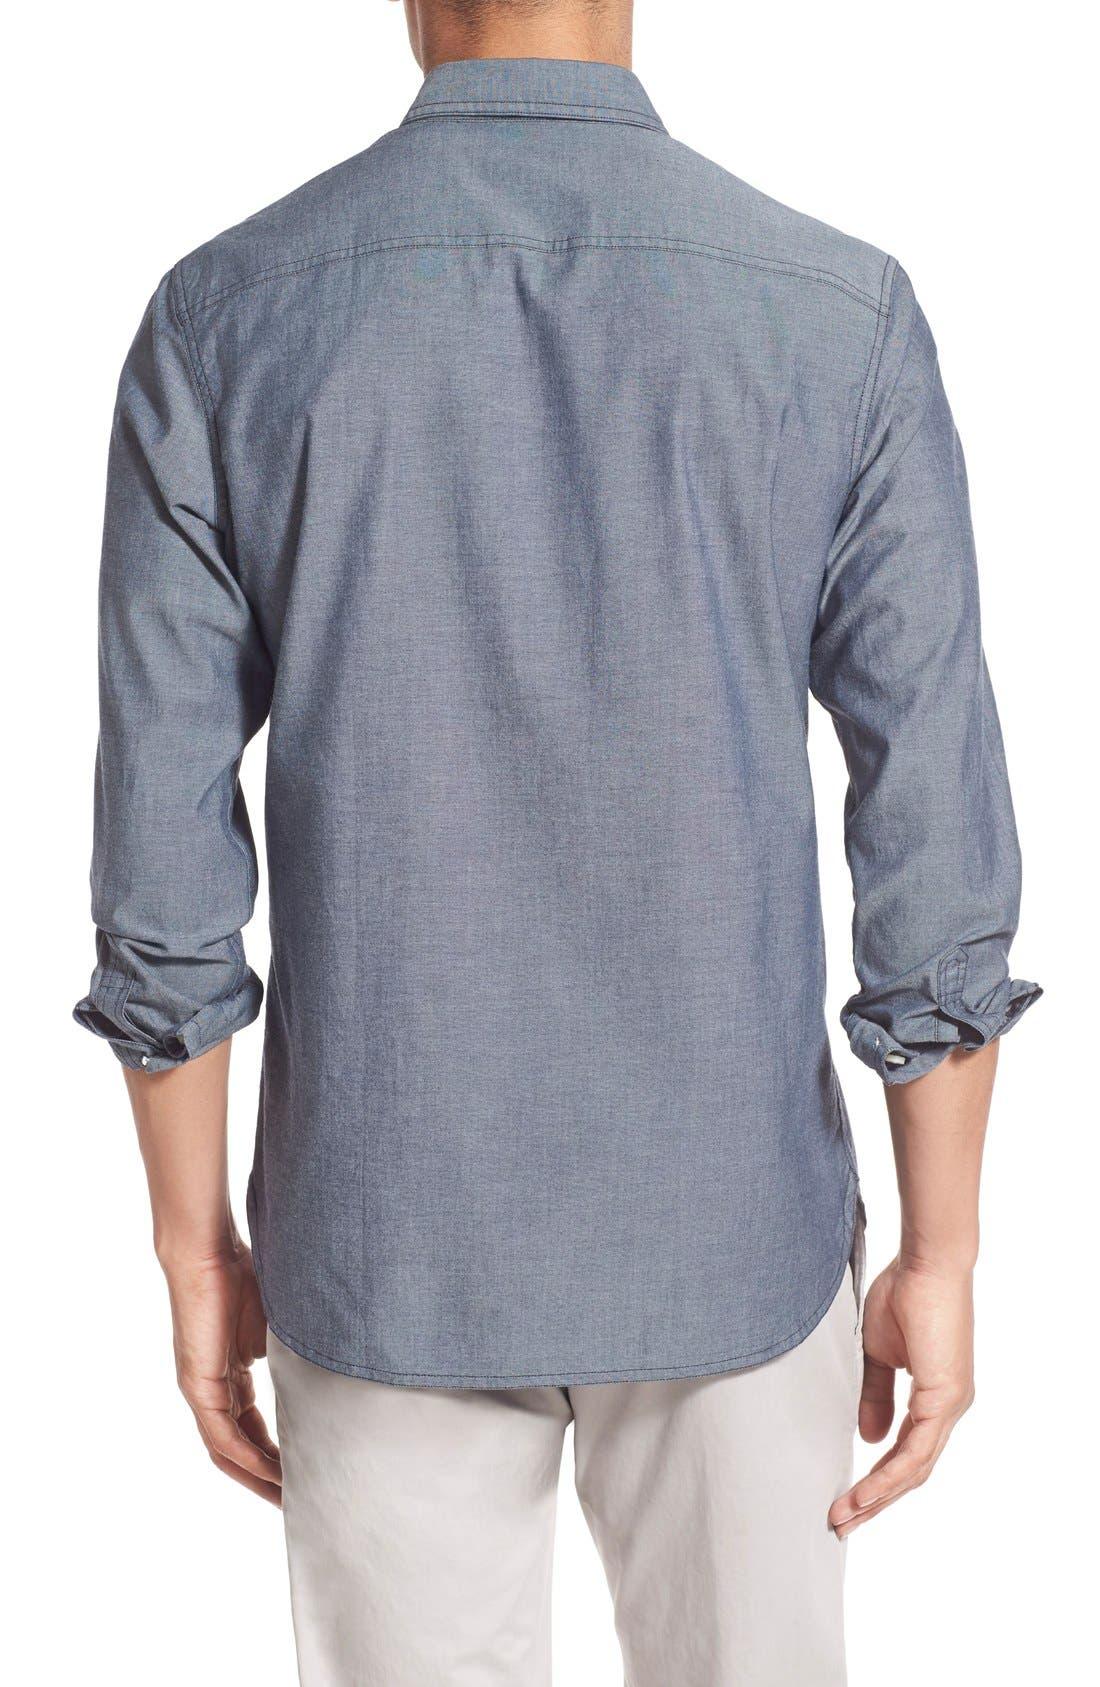 'Workwear' Trim Fit Chambray Sport Shirt,                             Alternate thumbnail 8, color,                             Light Blue